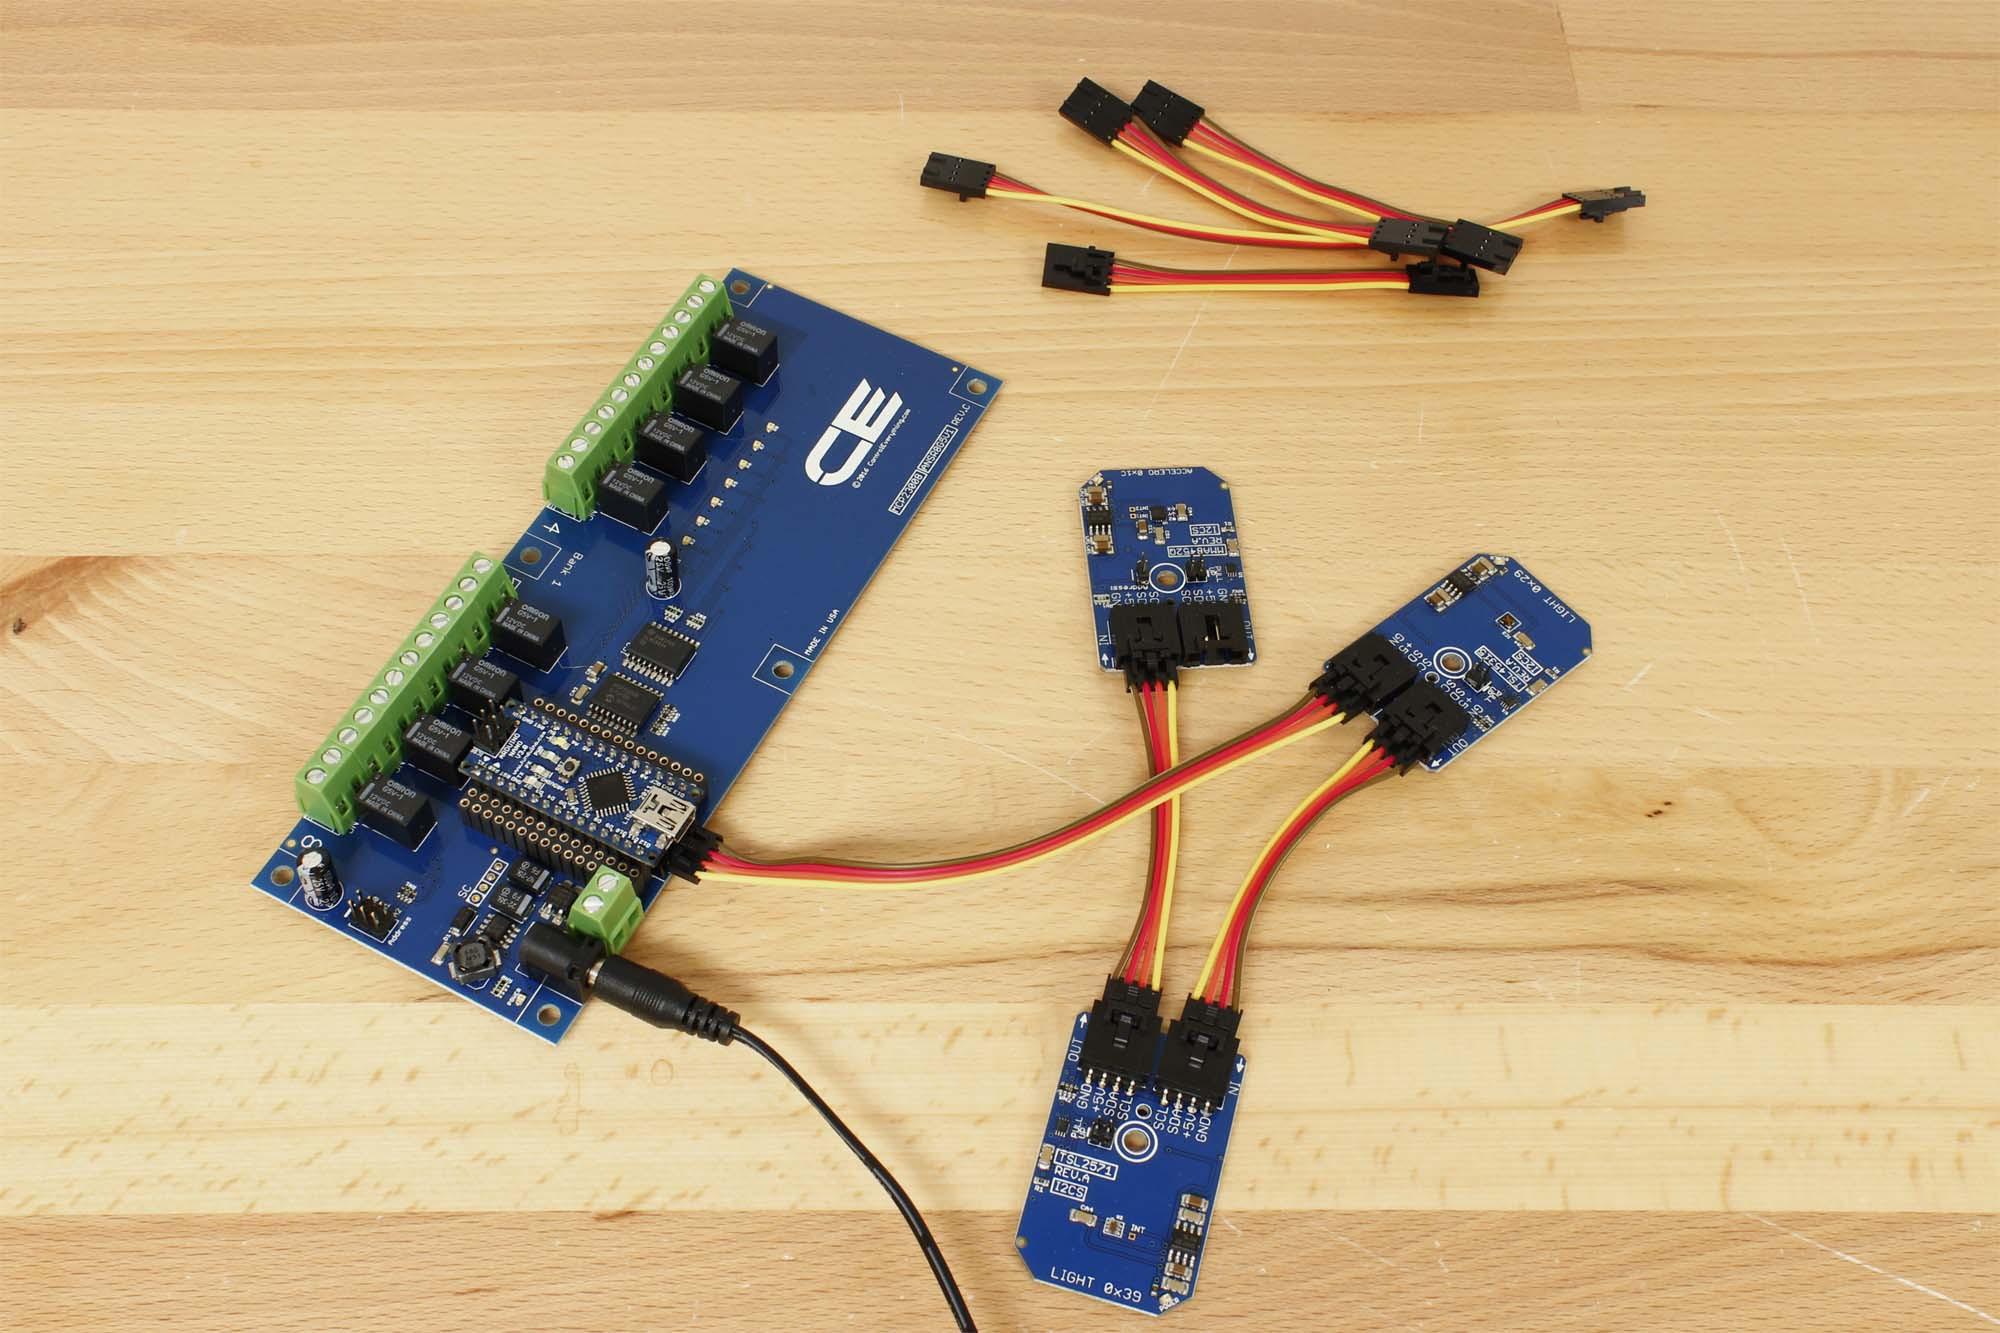 LTR-303 I2C Ambient Light Sensor Breakout Board